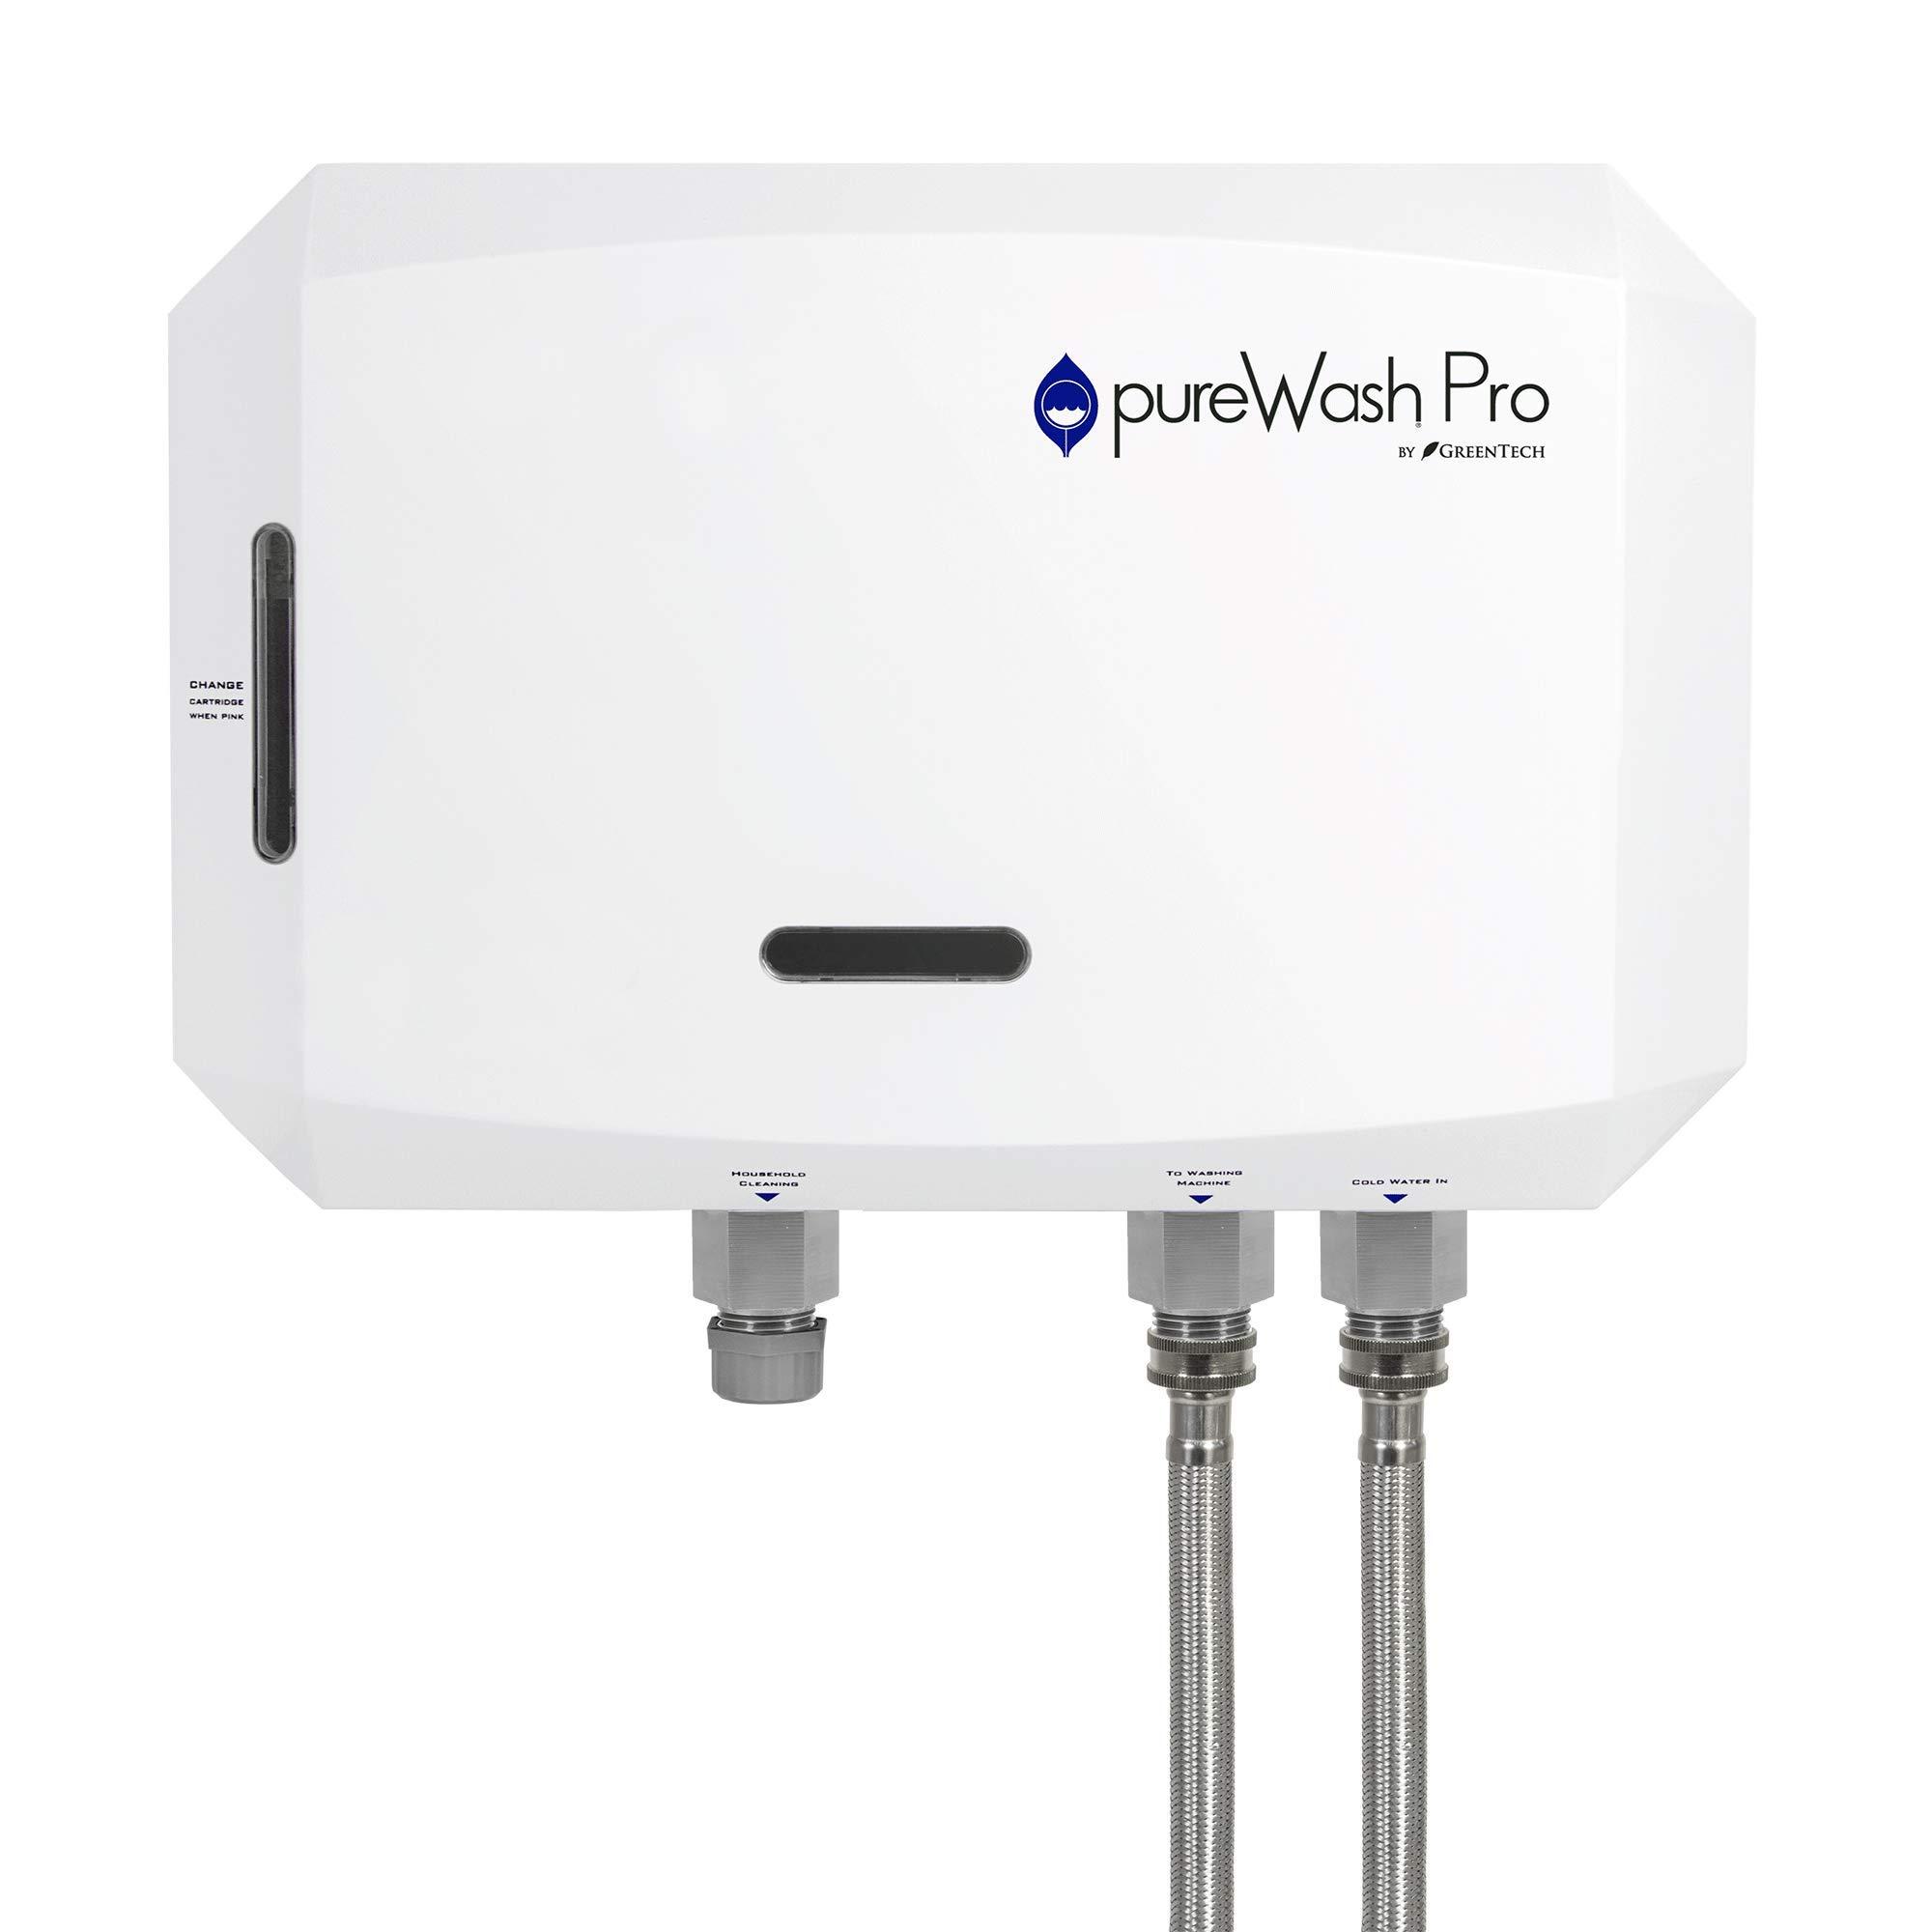 pureWash Pro X2 Detergent Less Laundry System